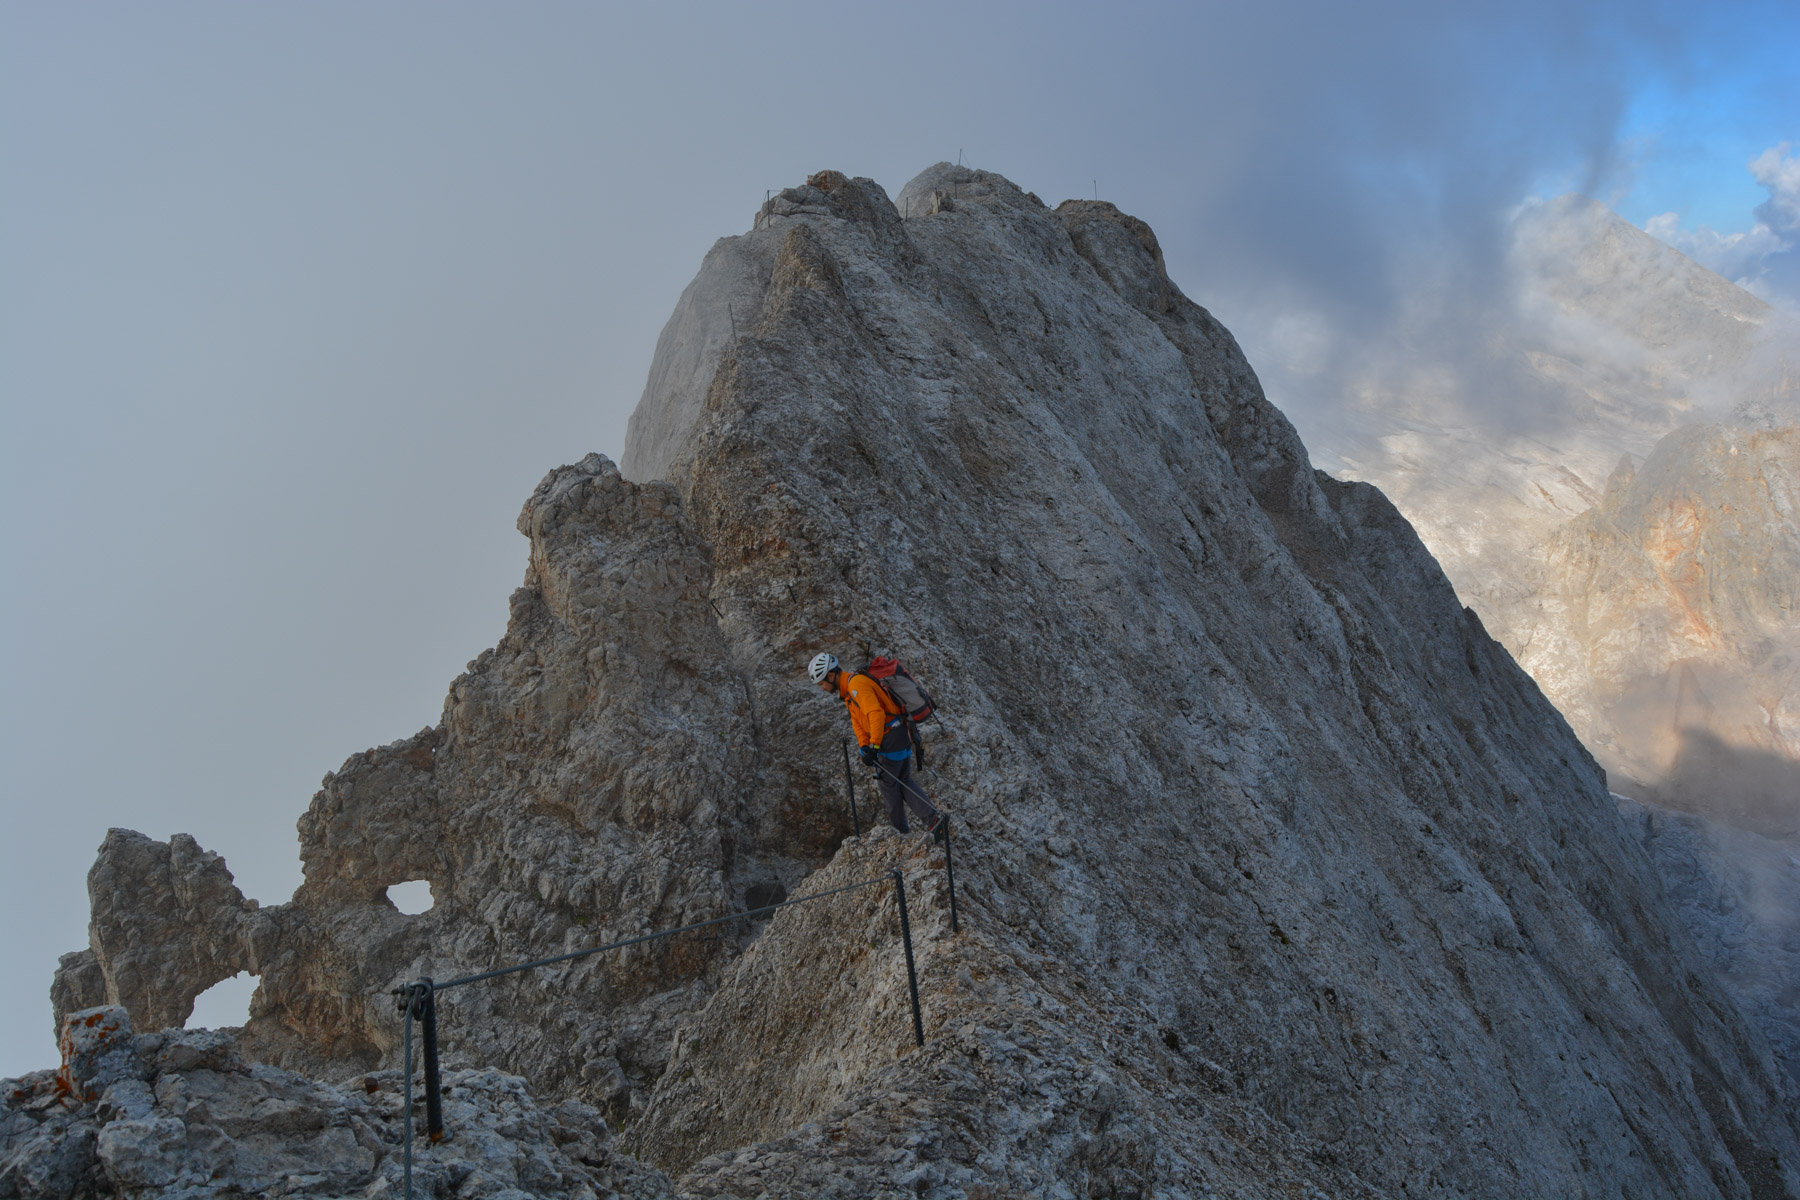 Via Eterna Brigata Cadore, Dolomites 22